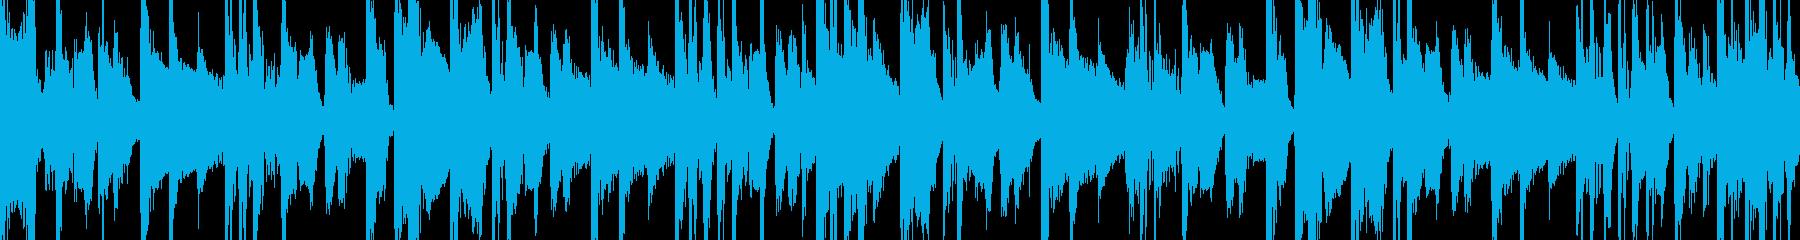 VOサンプル入りHIPHOPピアノループの再生済みの波形